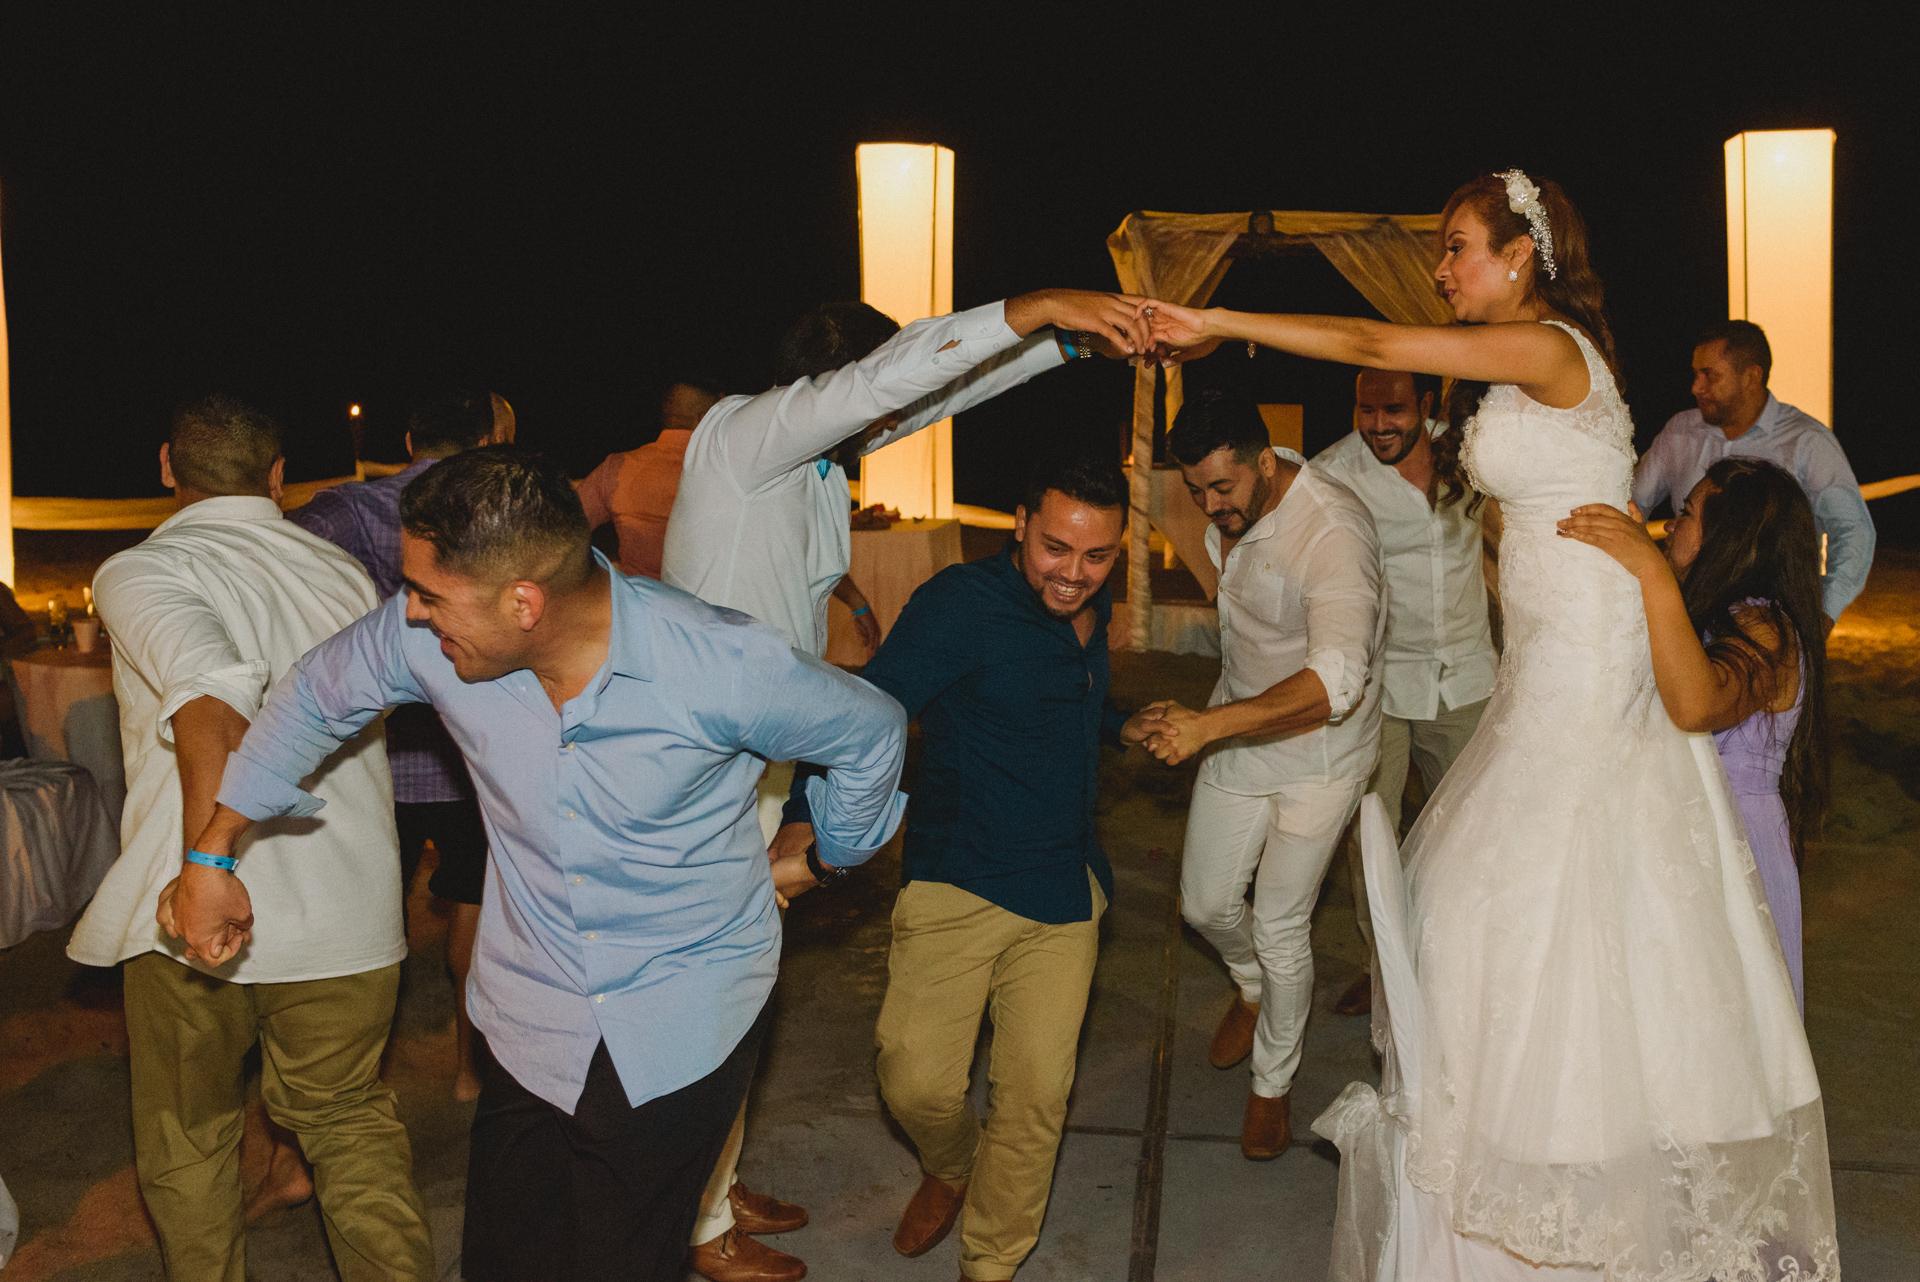 Wedding N&M BLOG luishoudin.com (117 de 174)